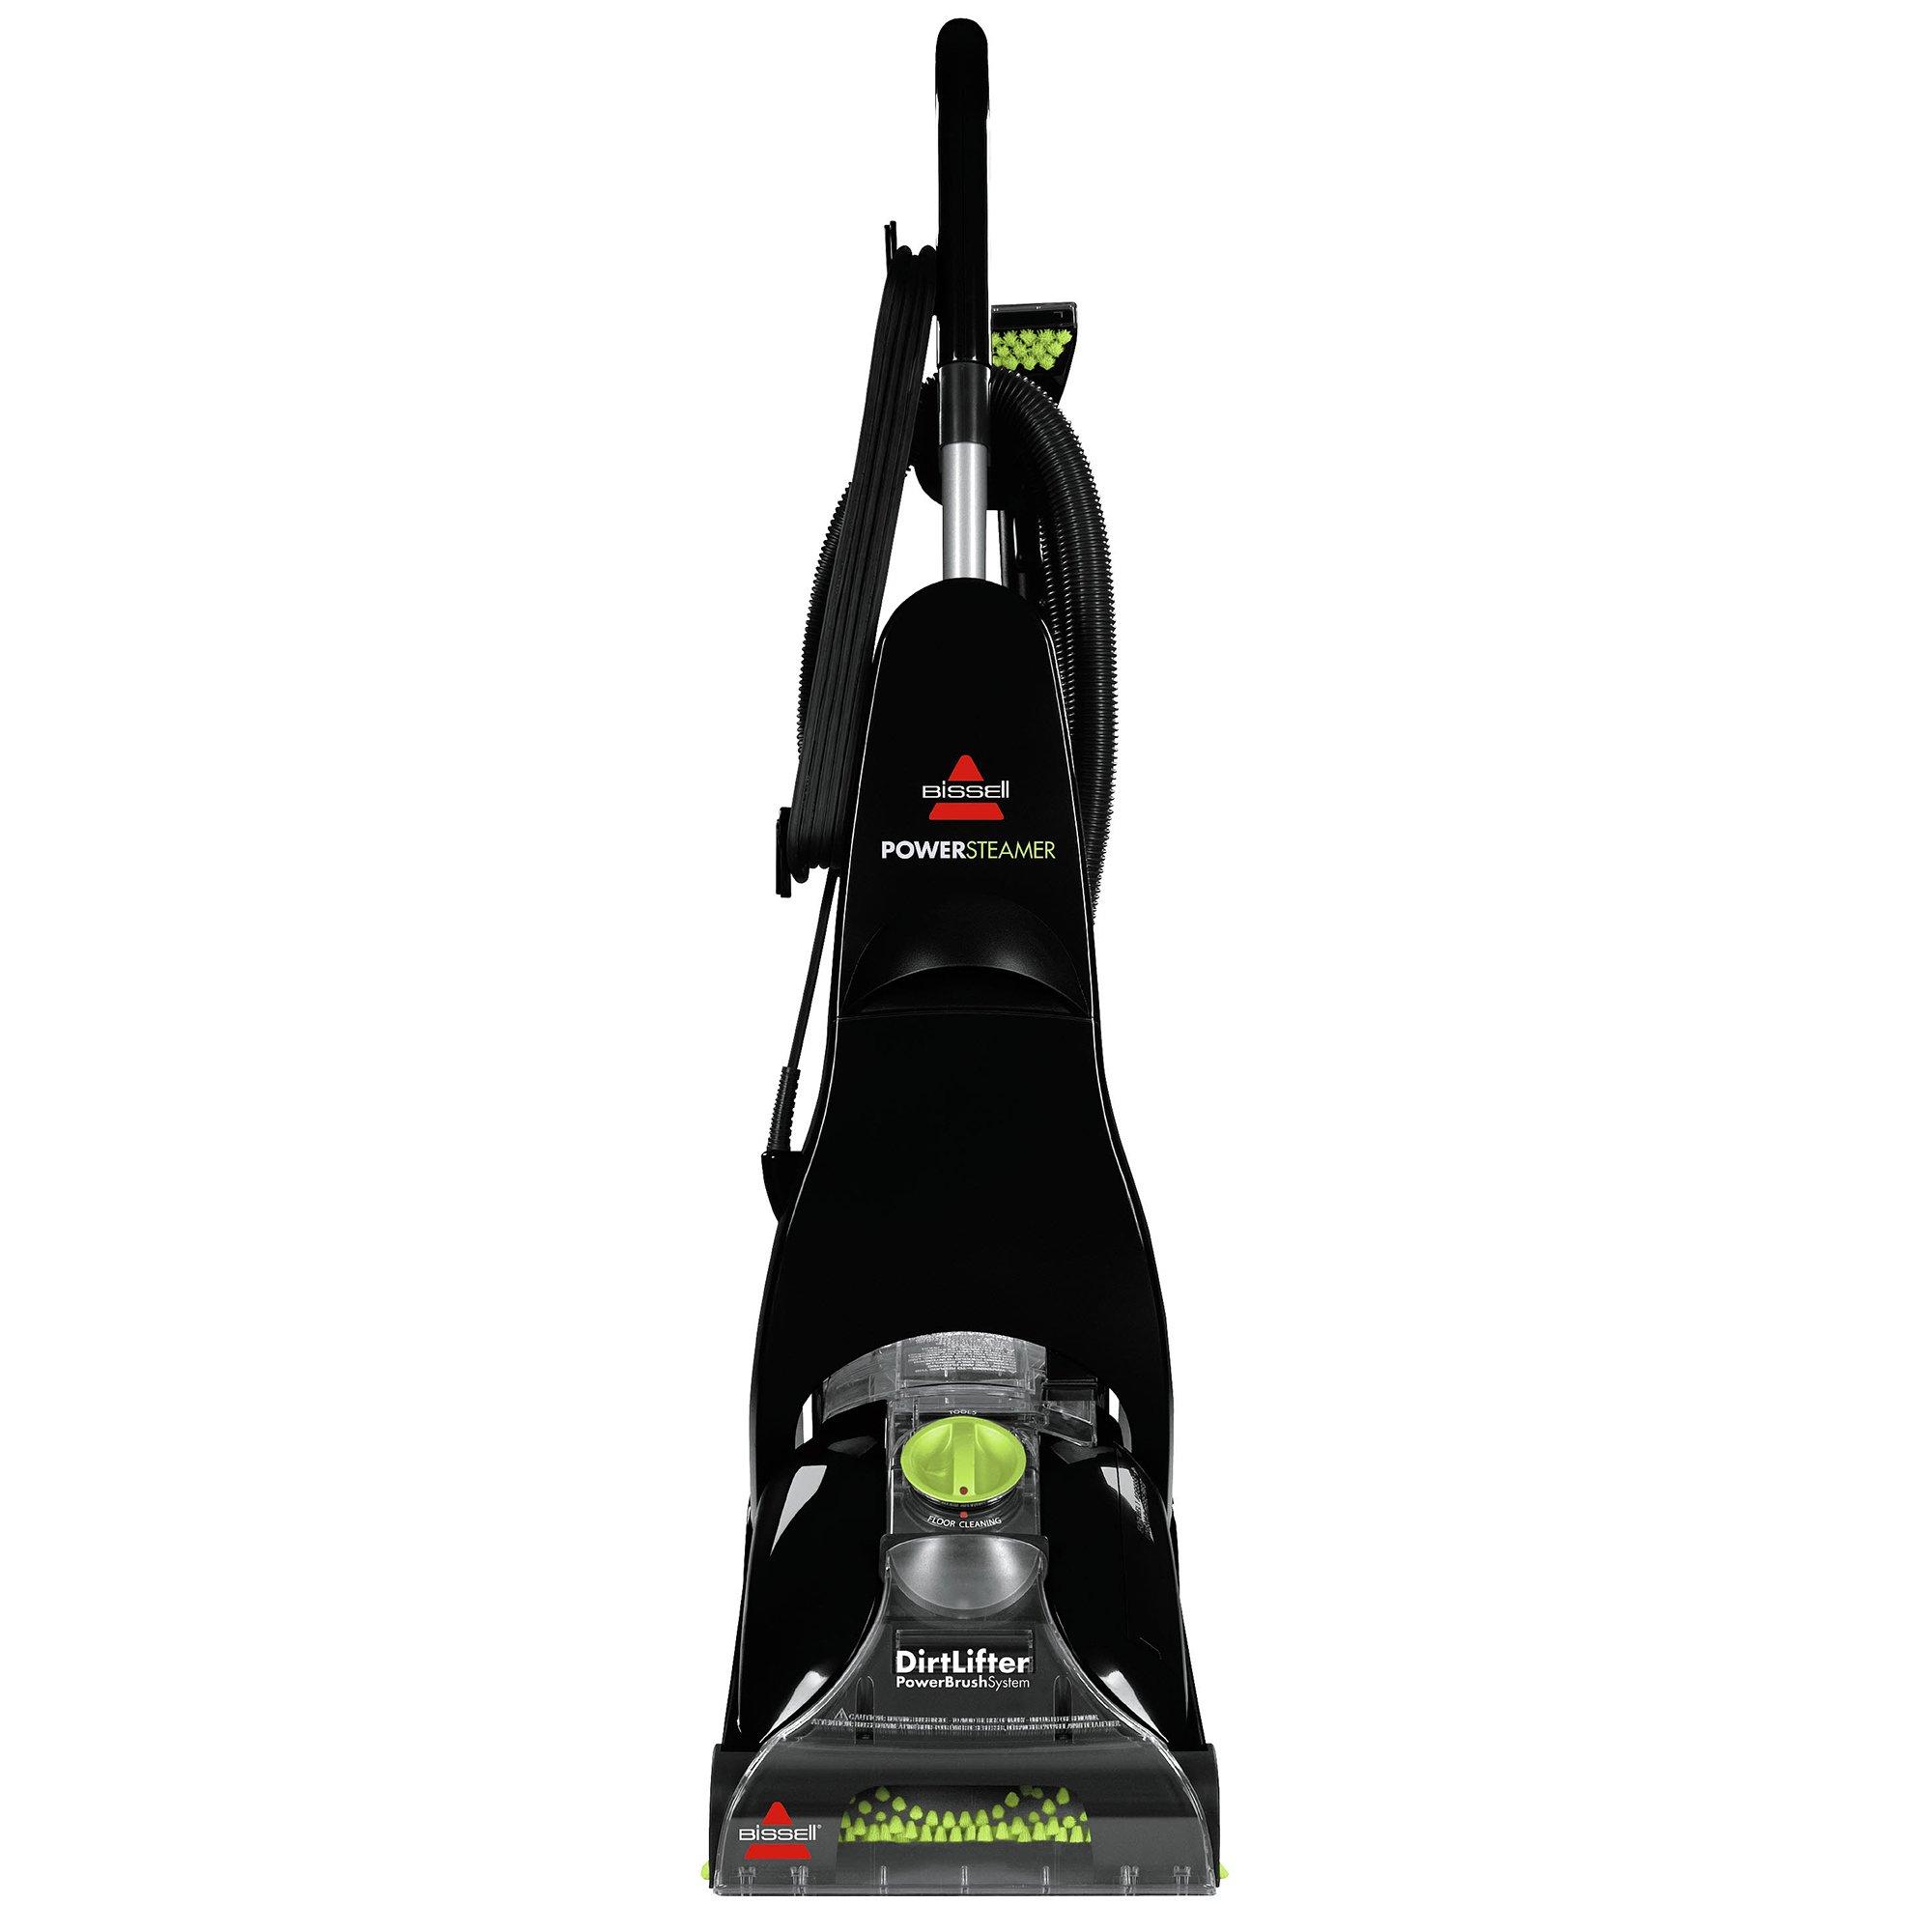 BISSELL Powerbrush Steamer Cleaner 16237